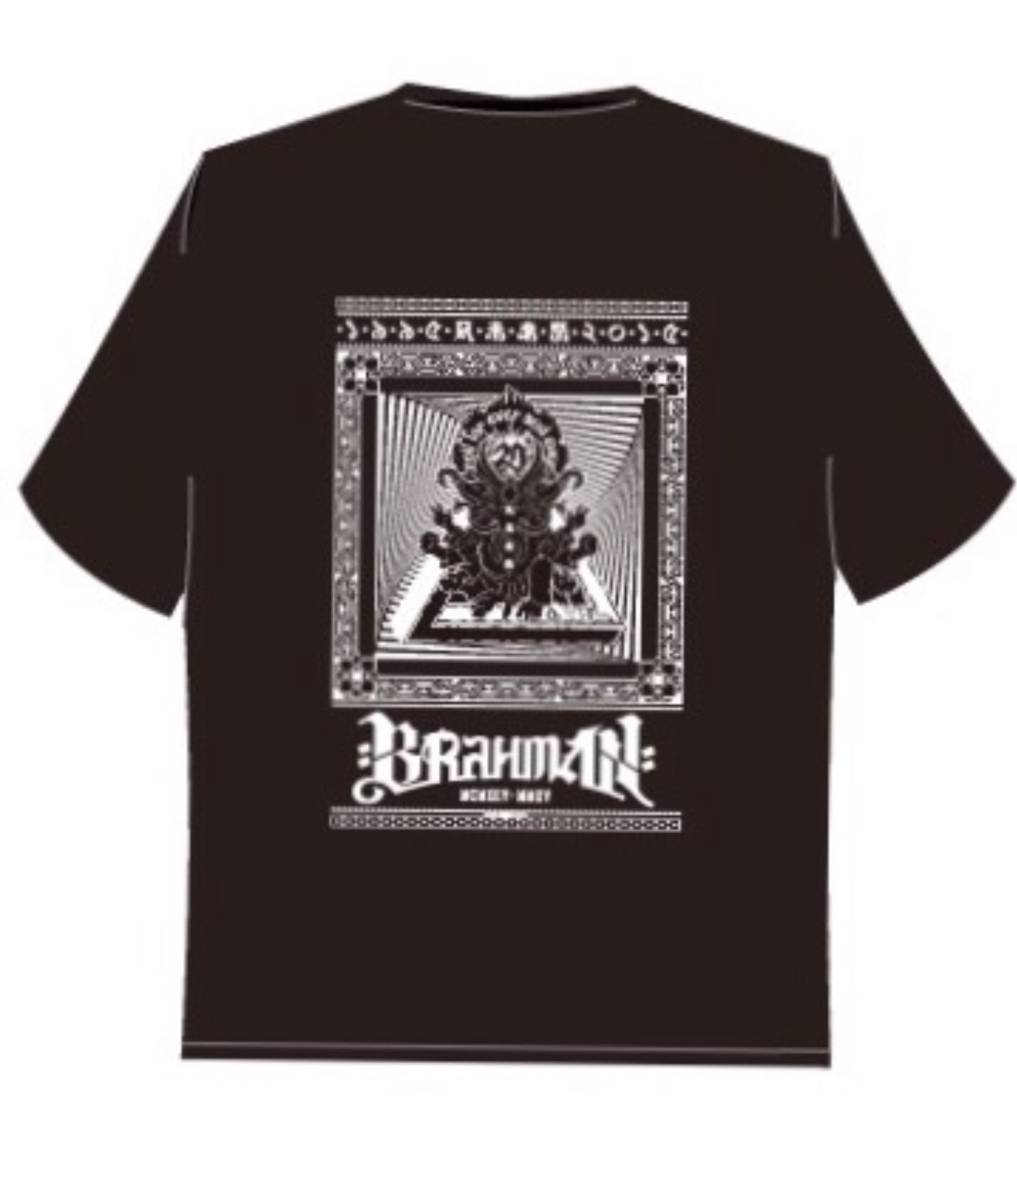 brahman 尽未来際 Tシャツ S ライブグッズの画像